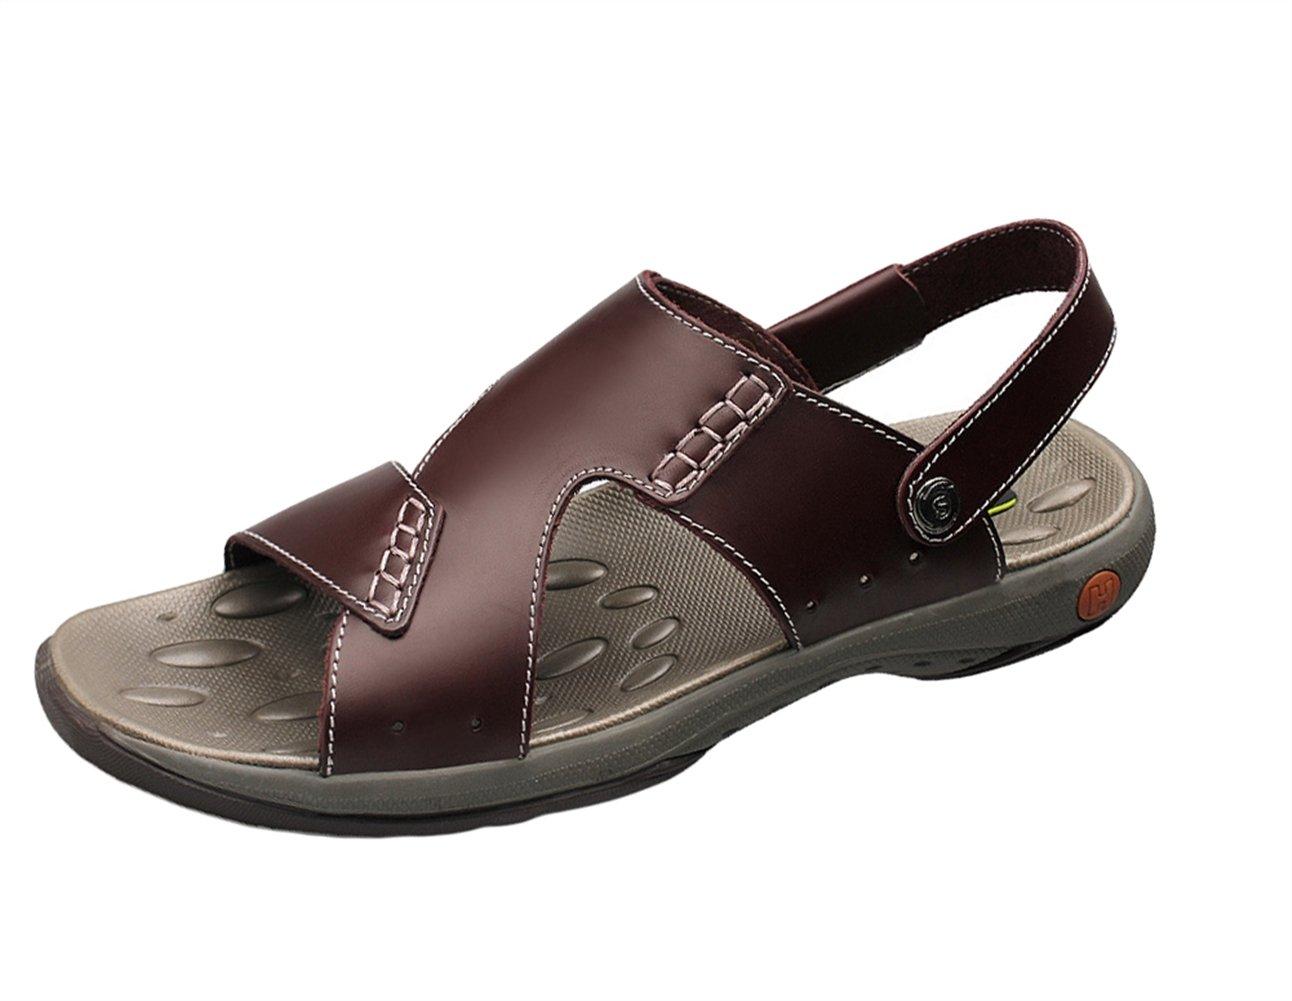 Insun Sandalias Para Hombre Cuero Casuales Sandalias Playa Zapatos 38 EU Marrón